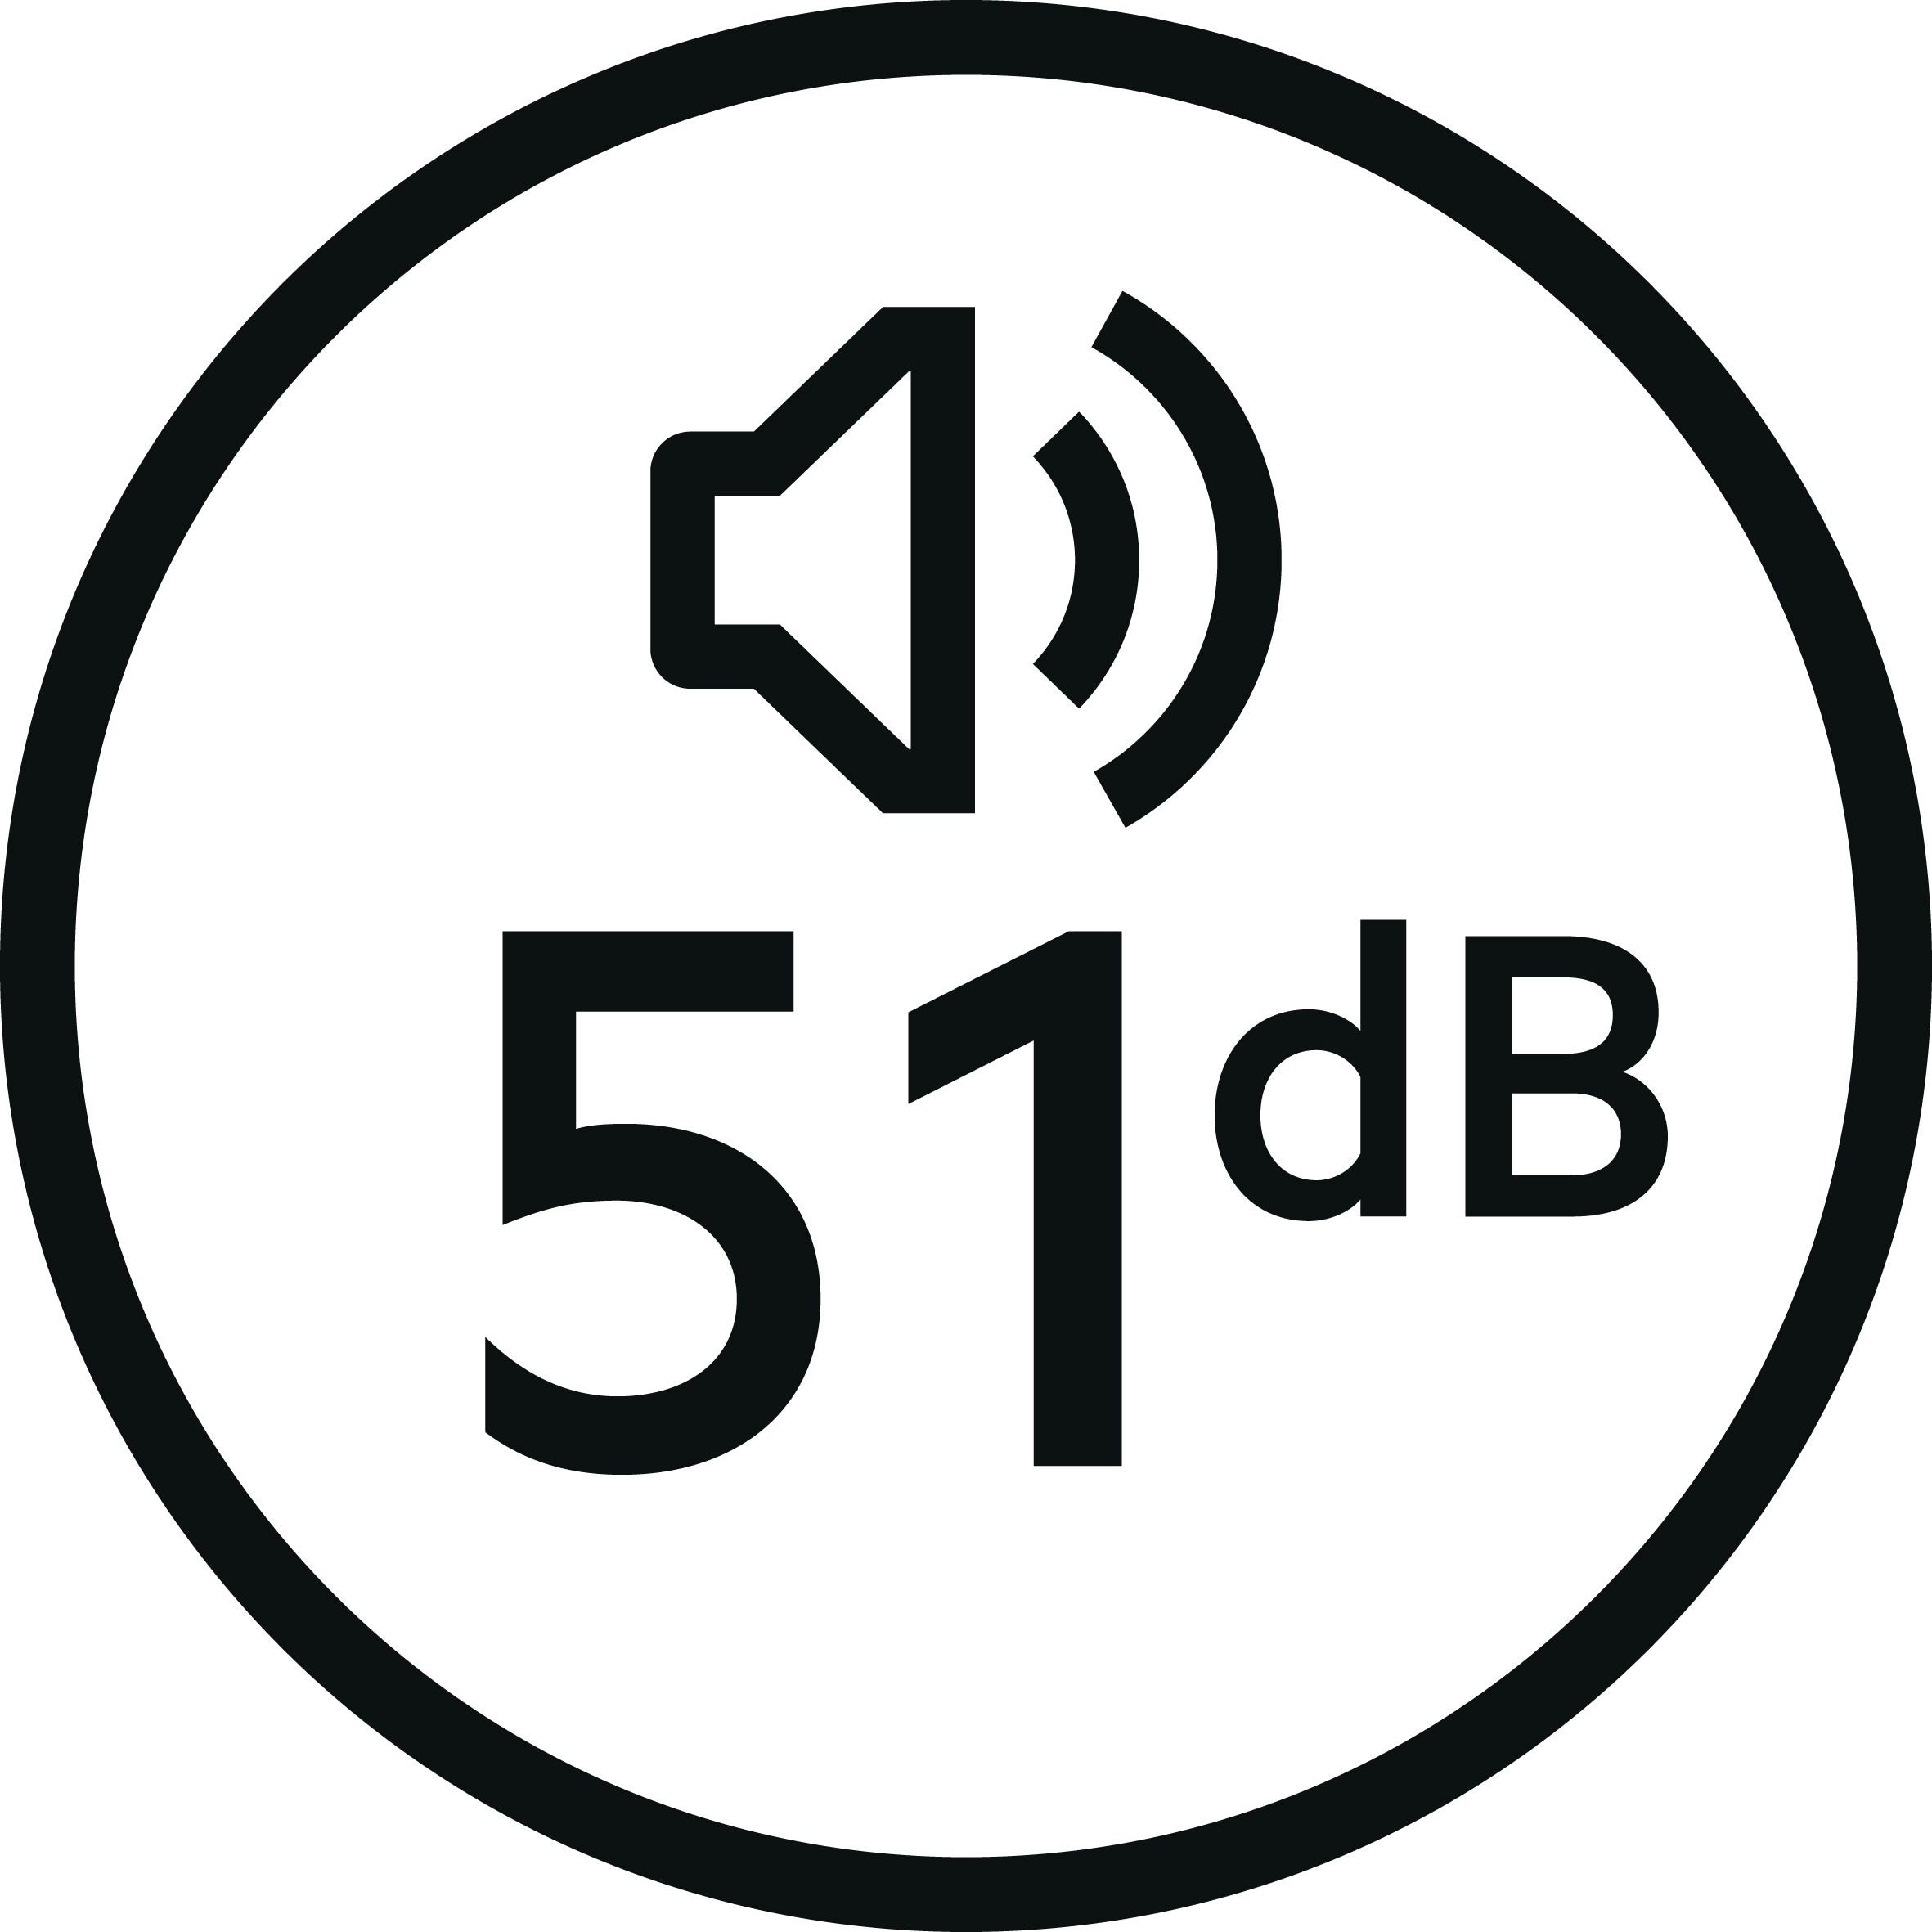 51dB-PSAAAP16PC569040.jpg